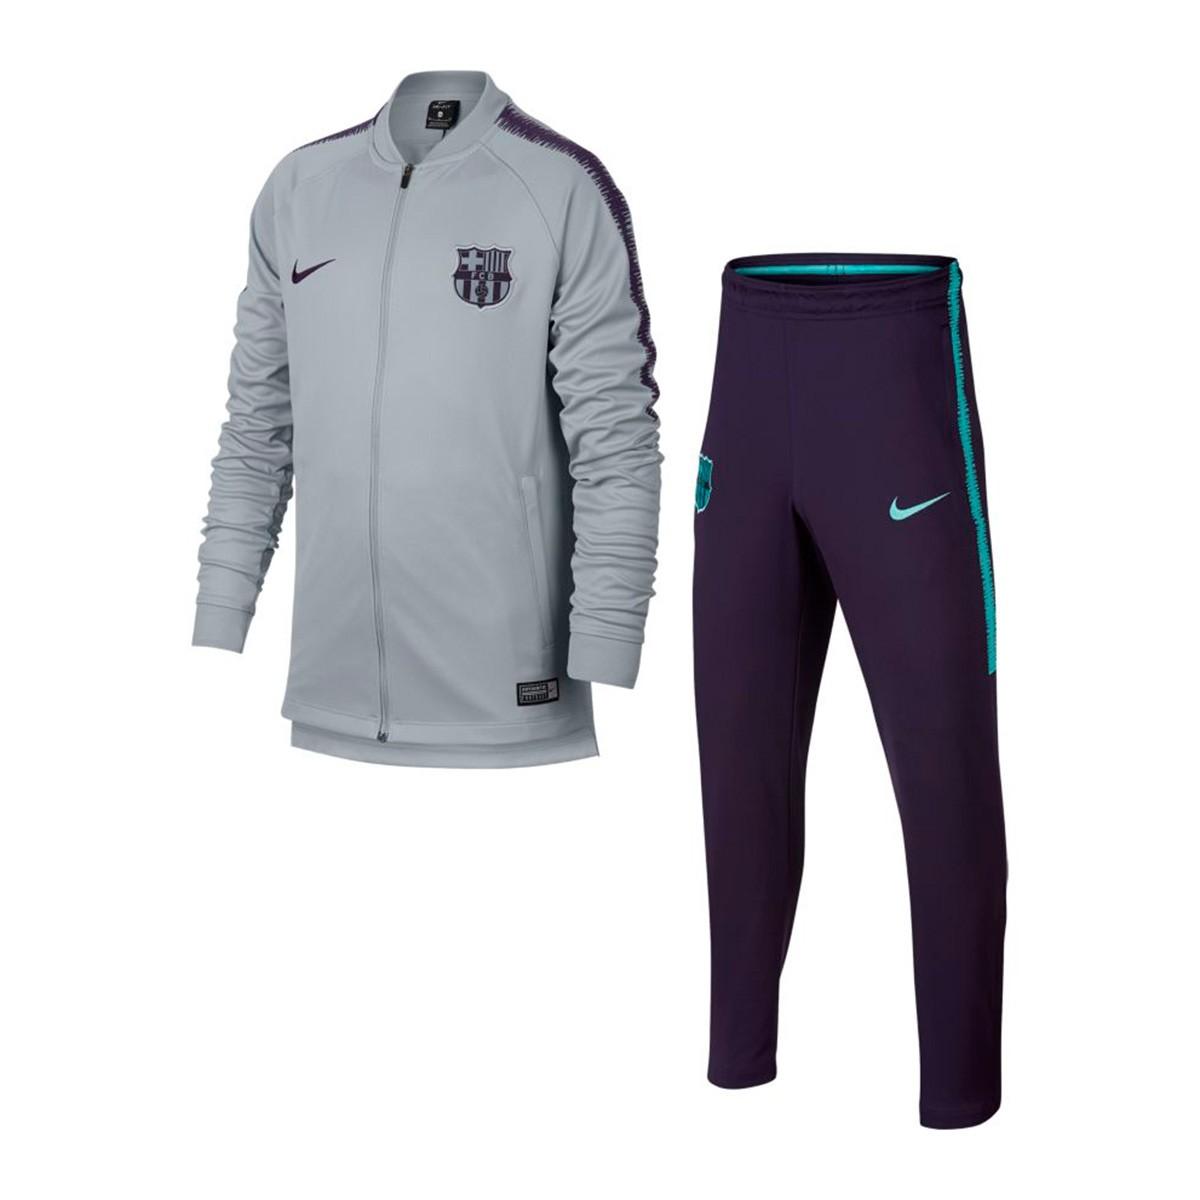 449f849cc564d Tracksuit Nike Kids Dry FC Barcelona Squad 2018-2019 Wolf grey-Purple  dynasty - Football store Fútbol Emotion